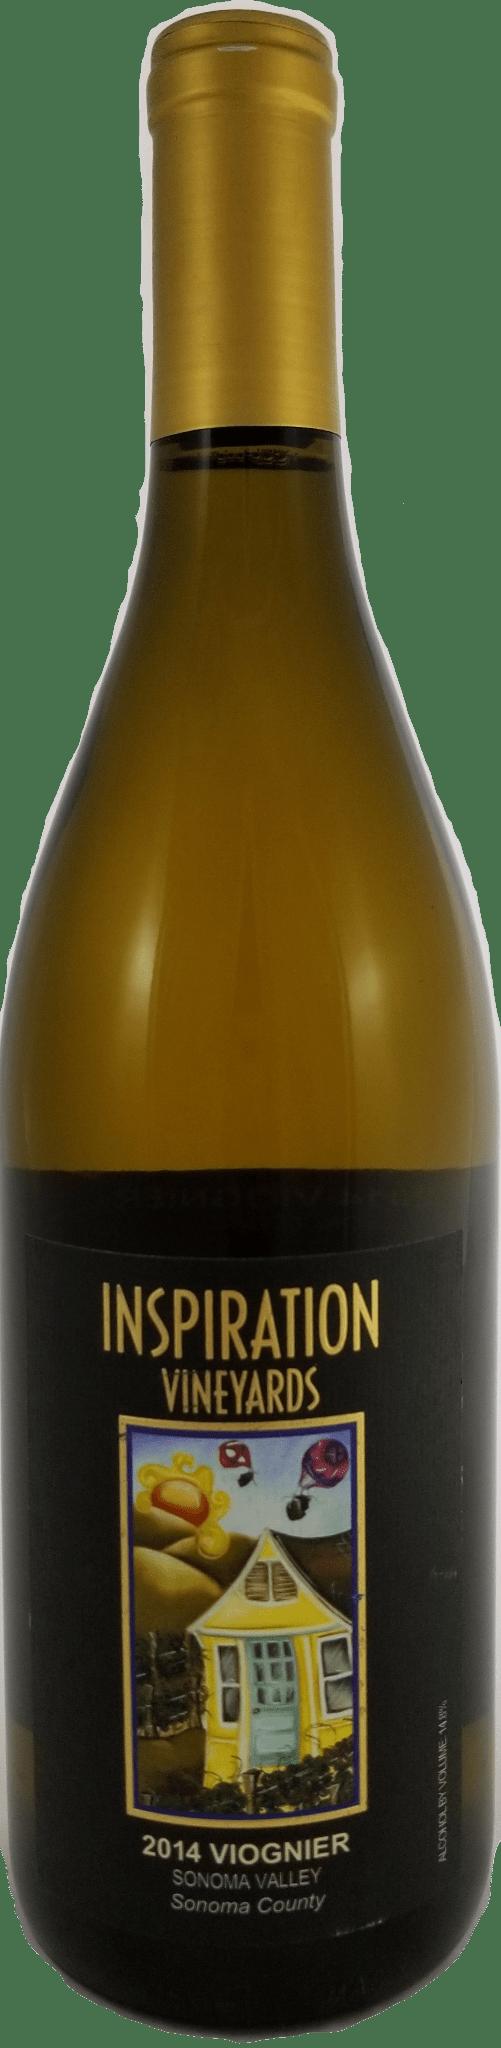 inspiration-viognier14-bottle1-1-1-1